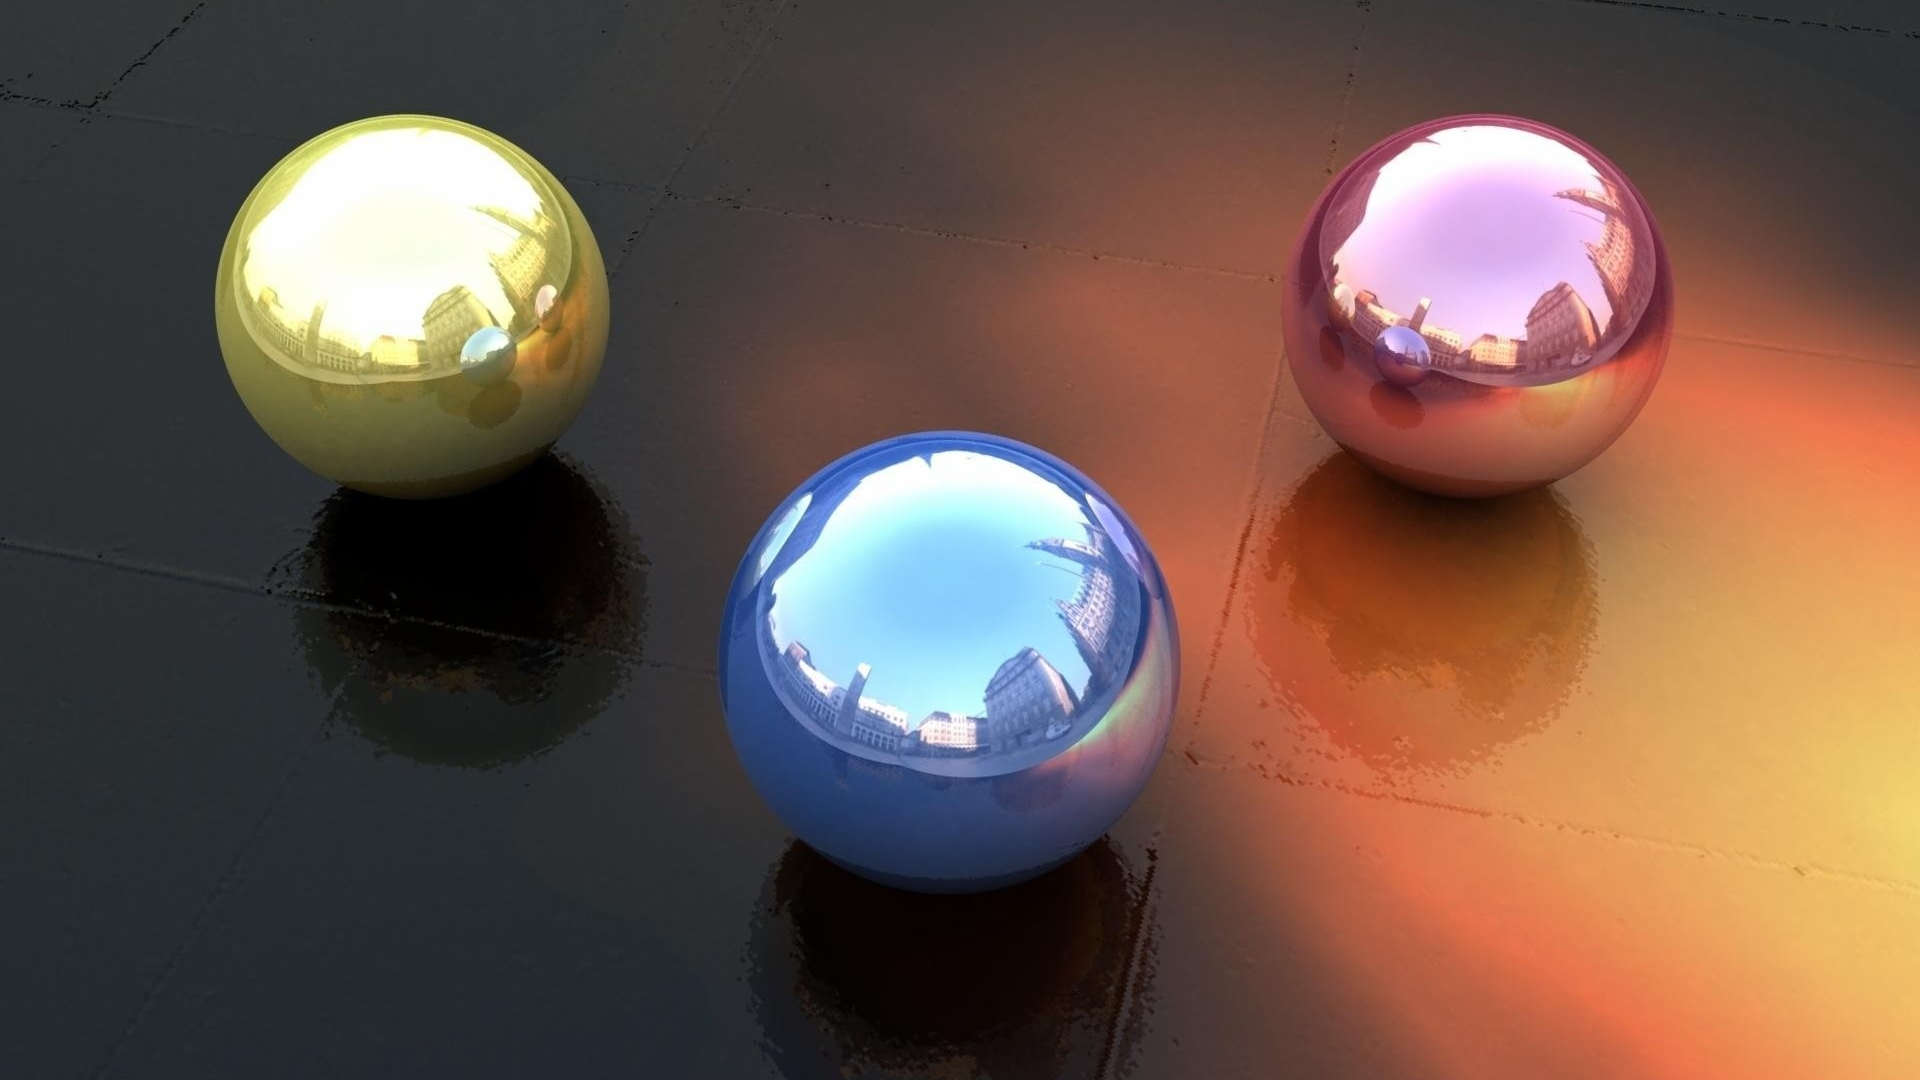 download wallpaper 1920x1080 balls, form, reflection full hd 1080p